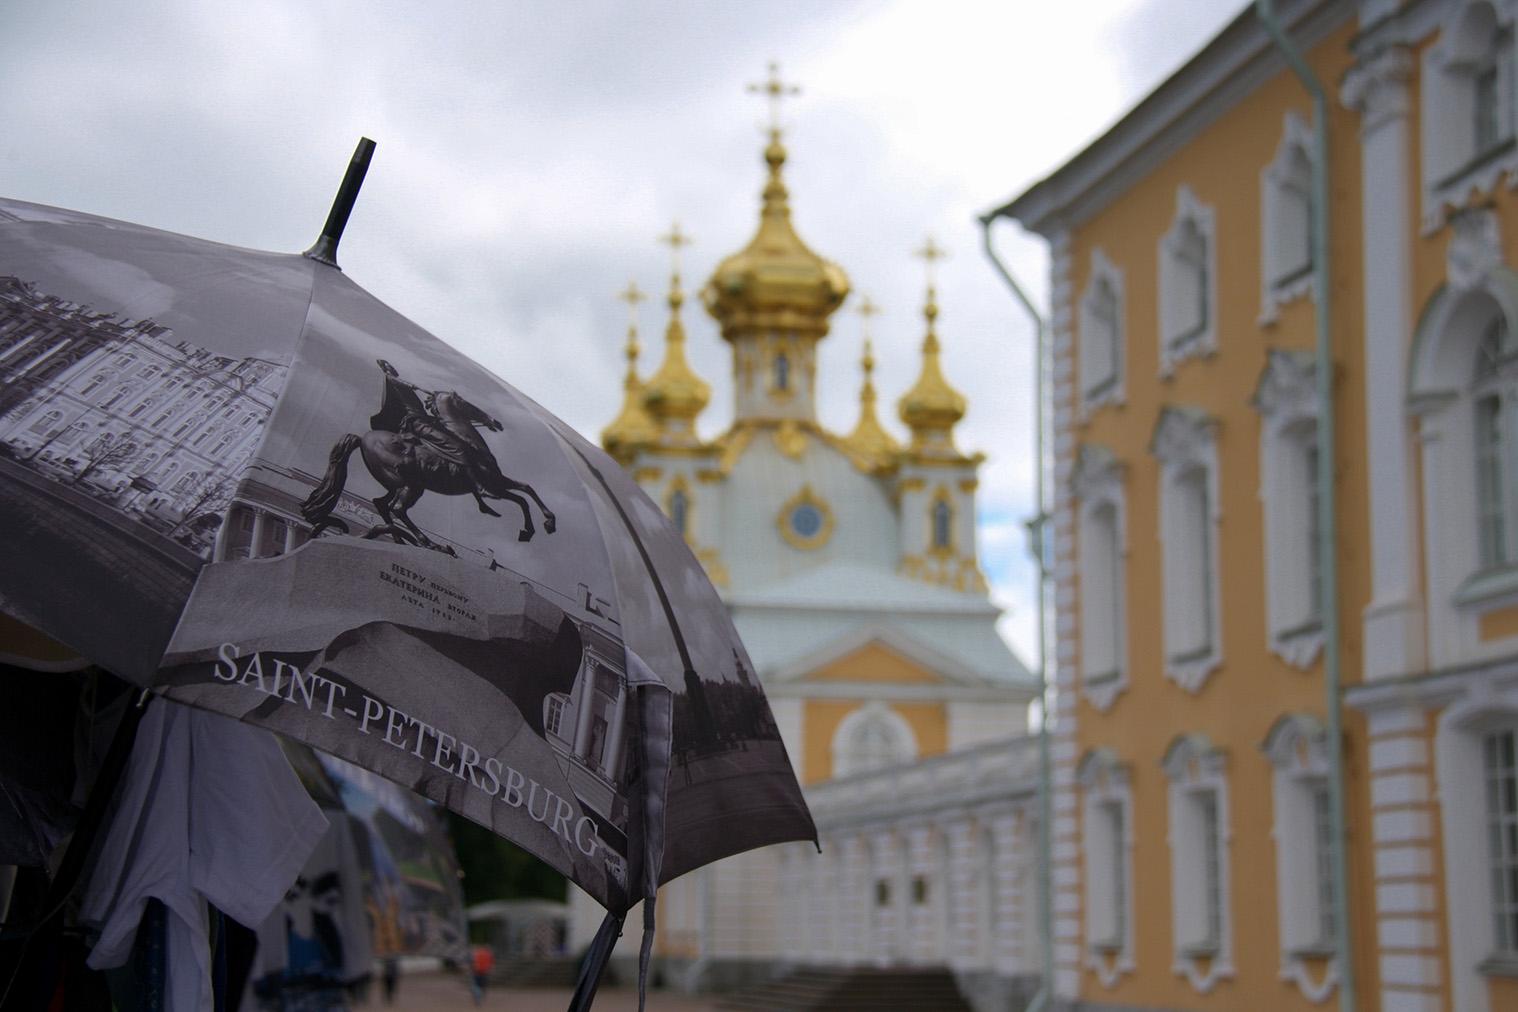 Petrohrad - Petrodvorec